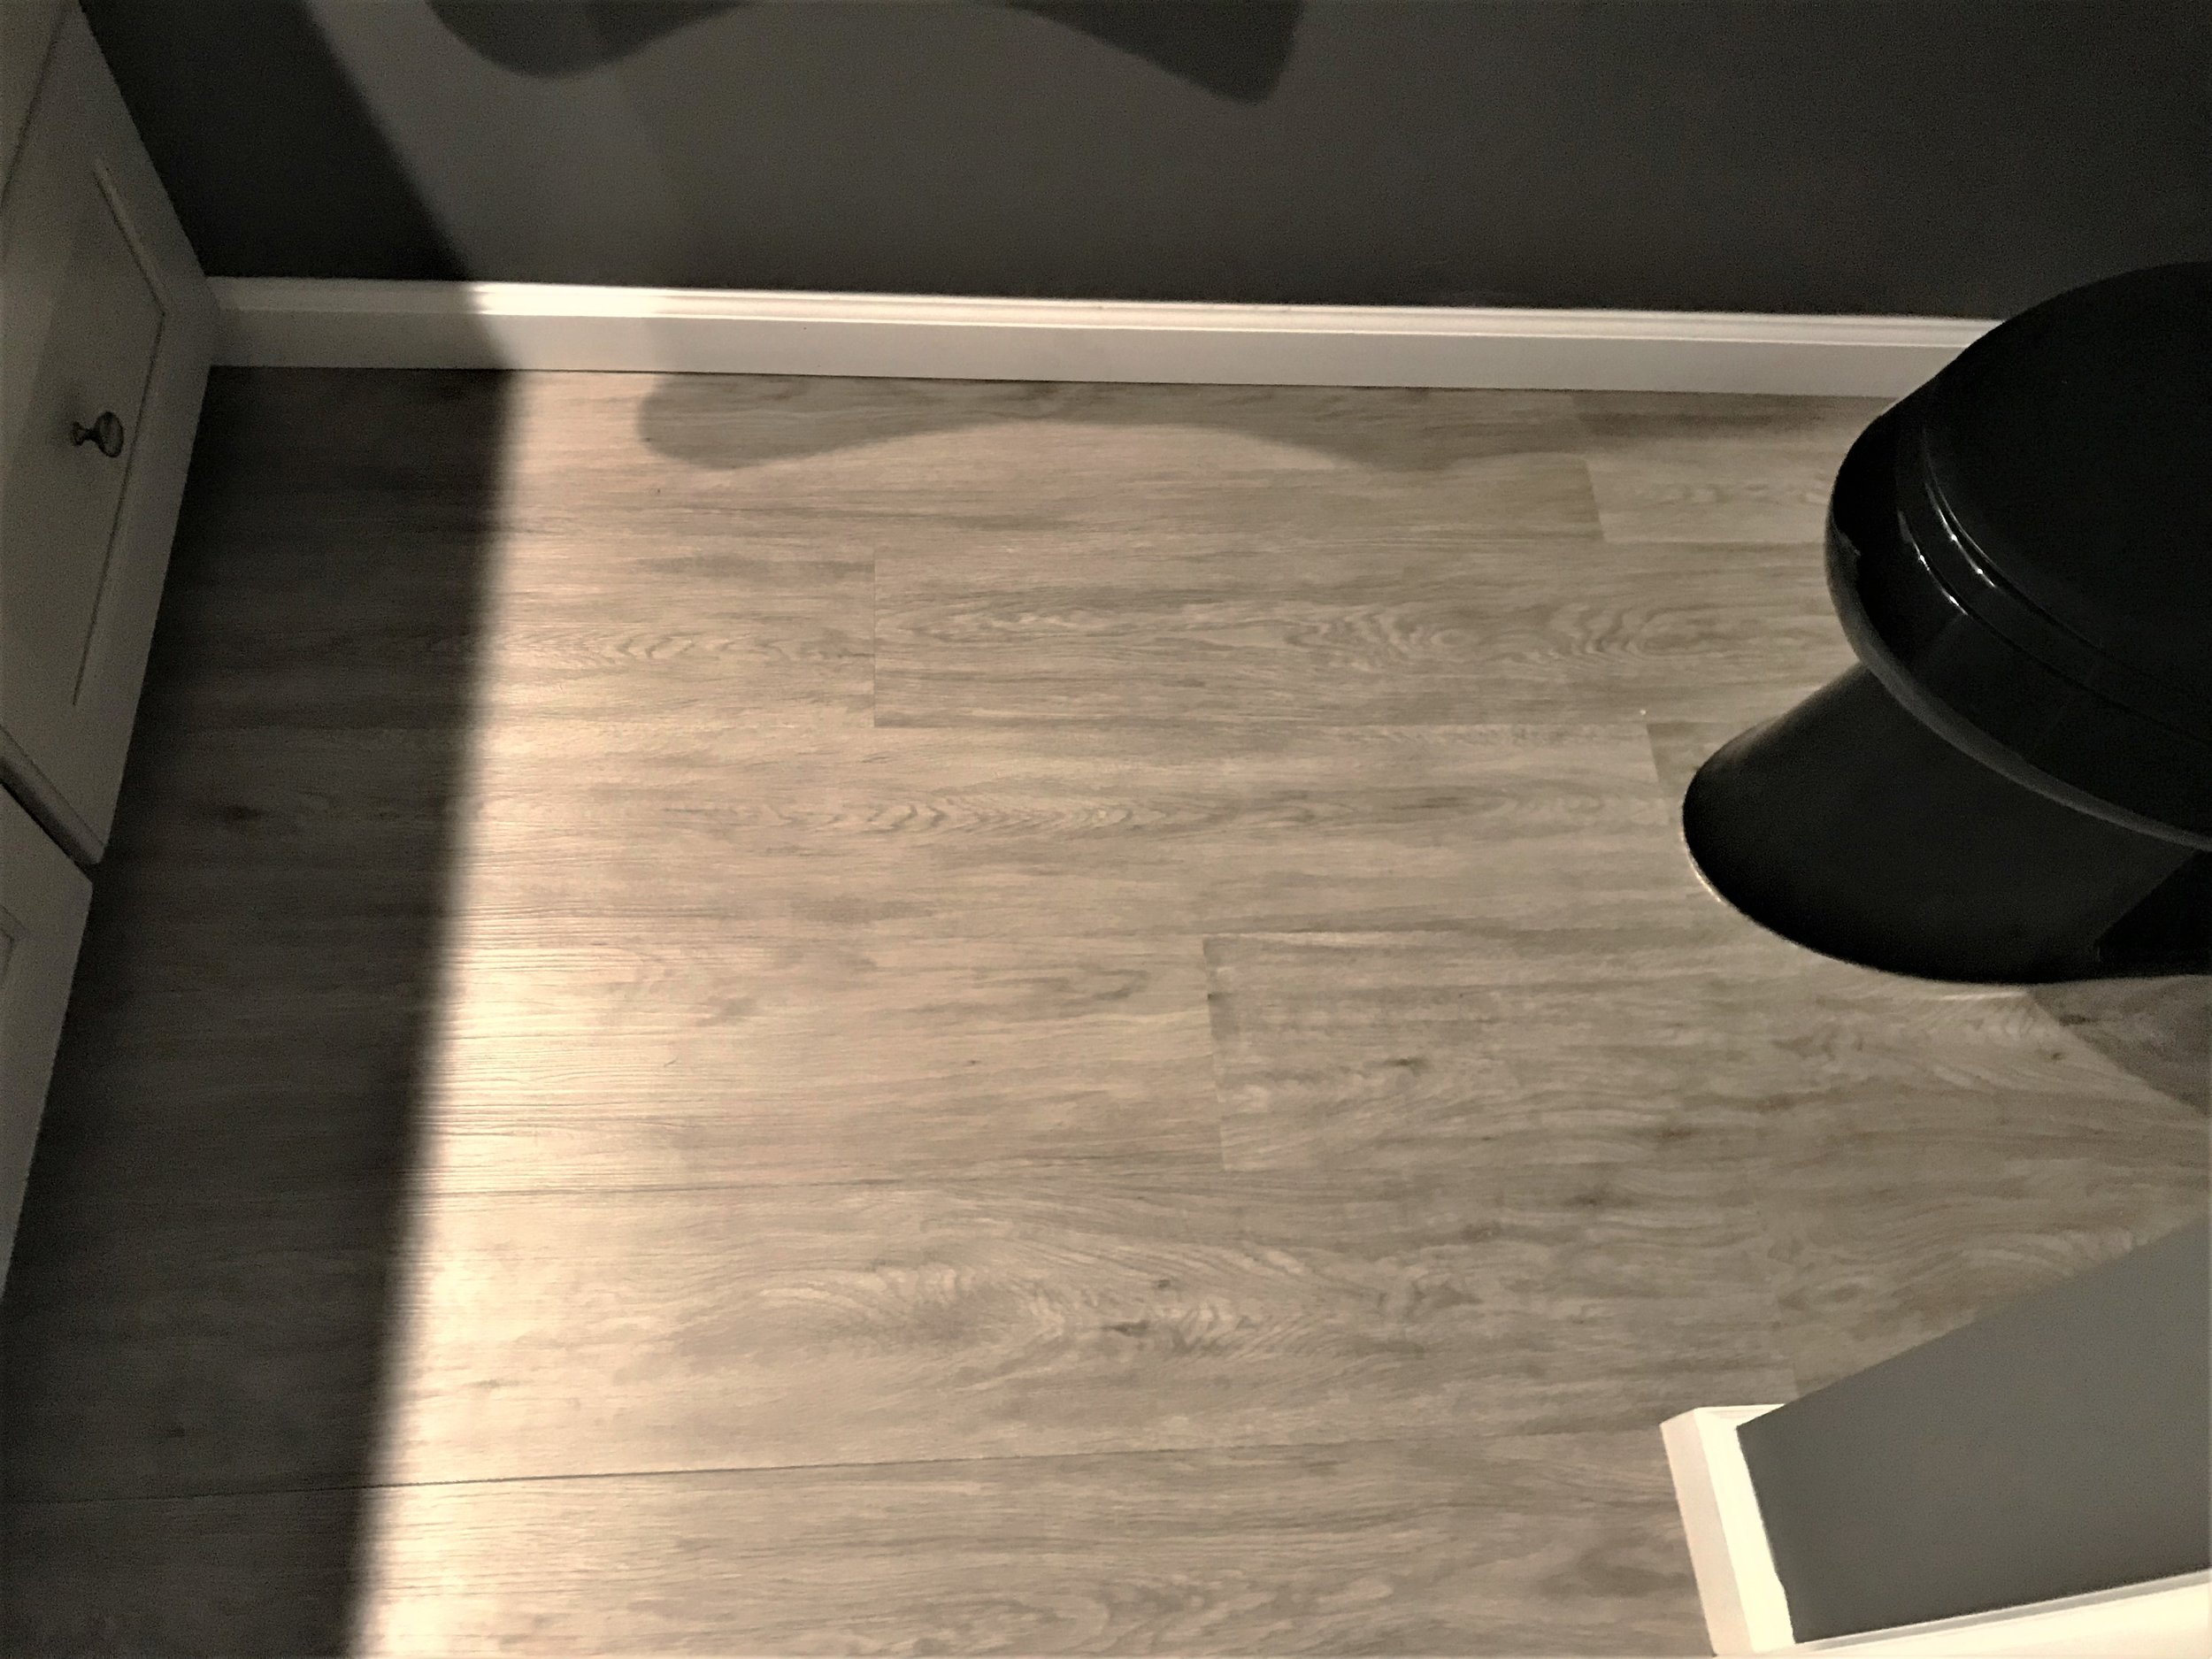 laminate flooring in bathroom.jpeg